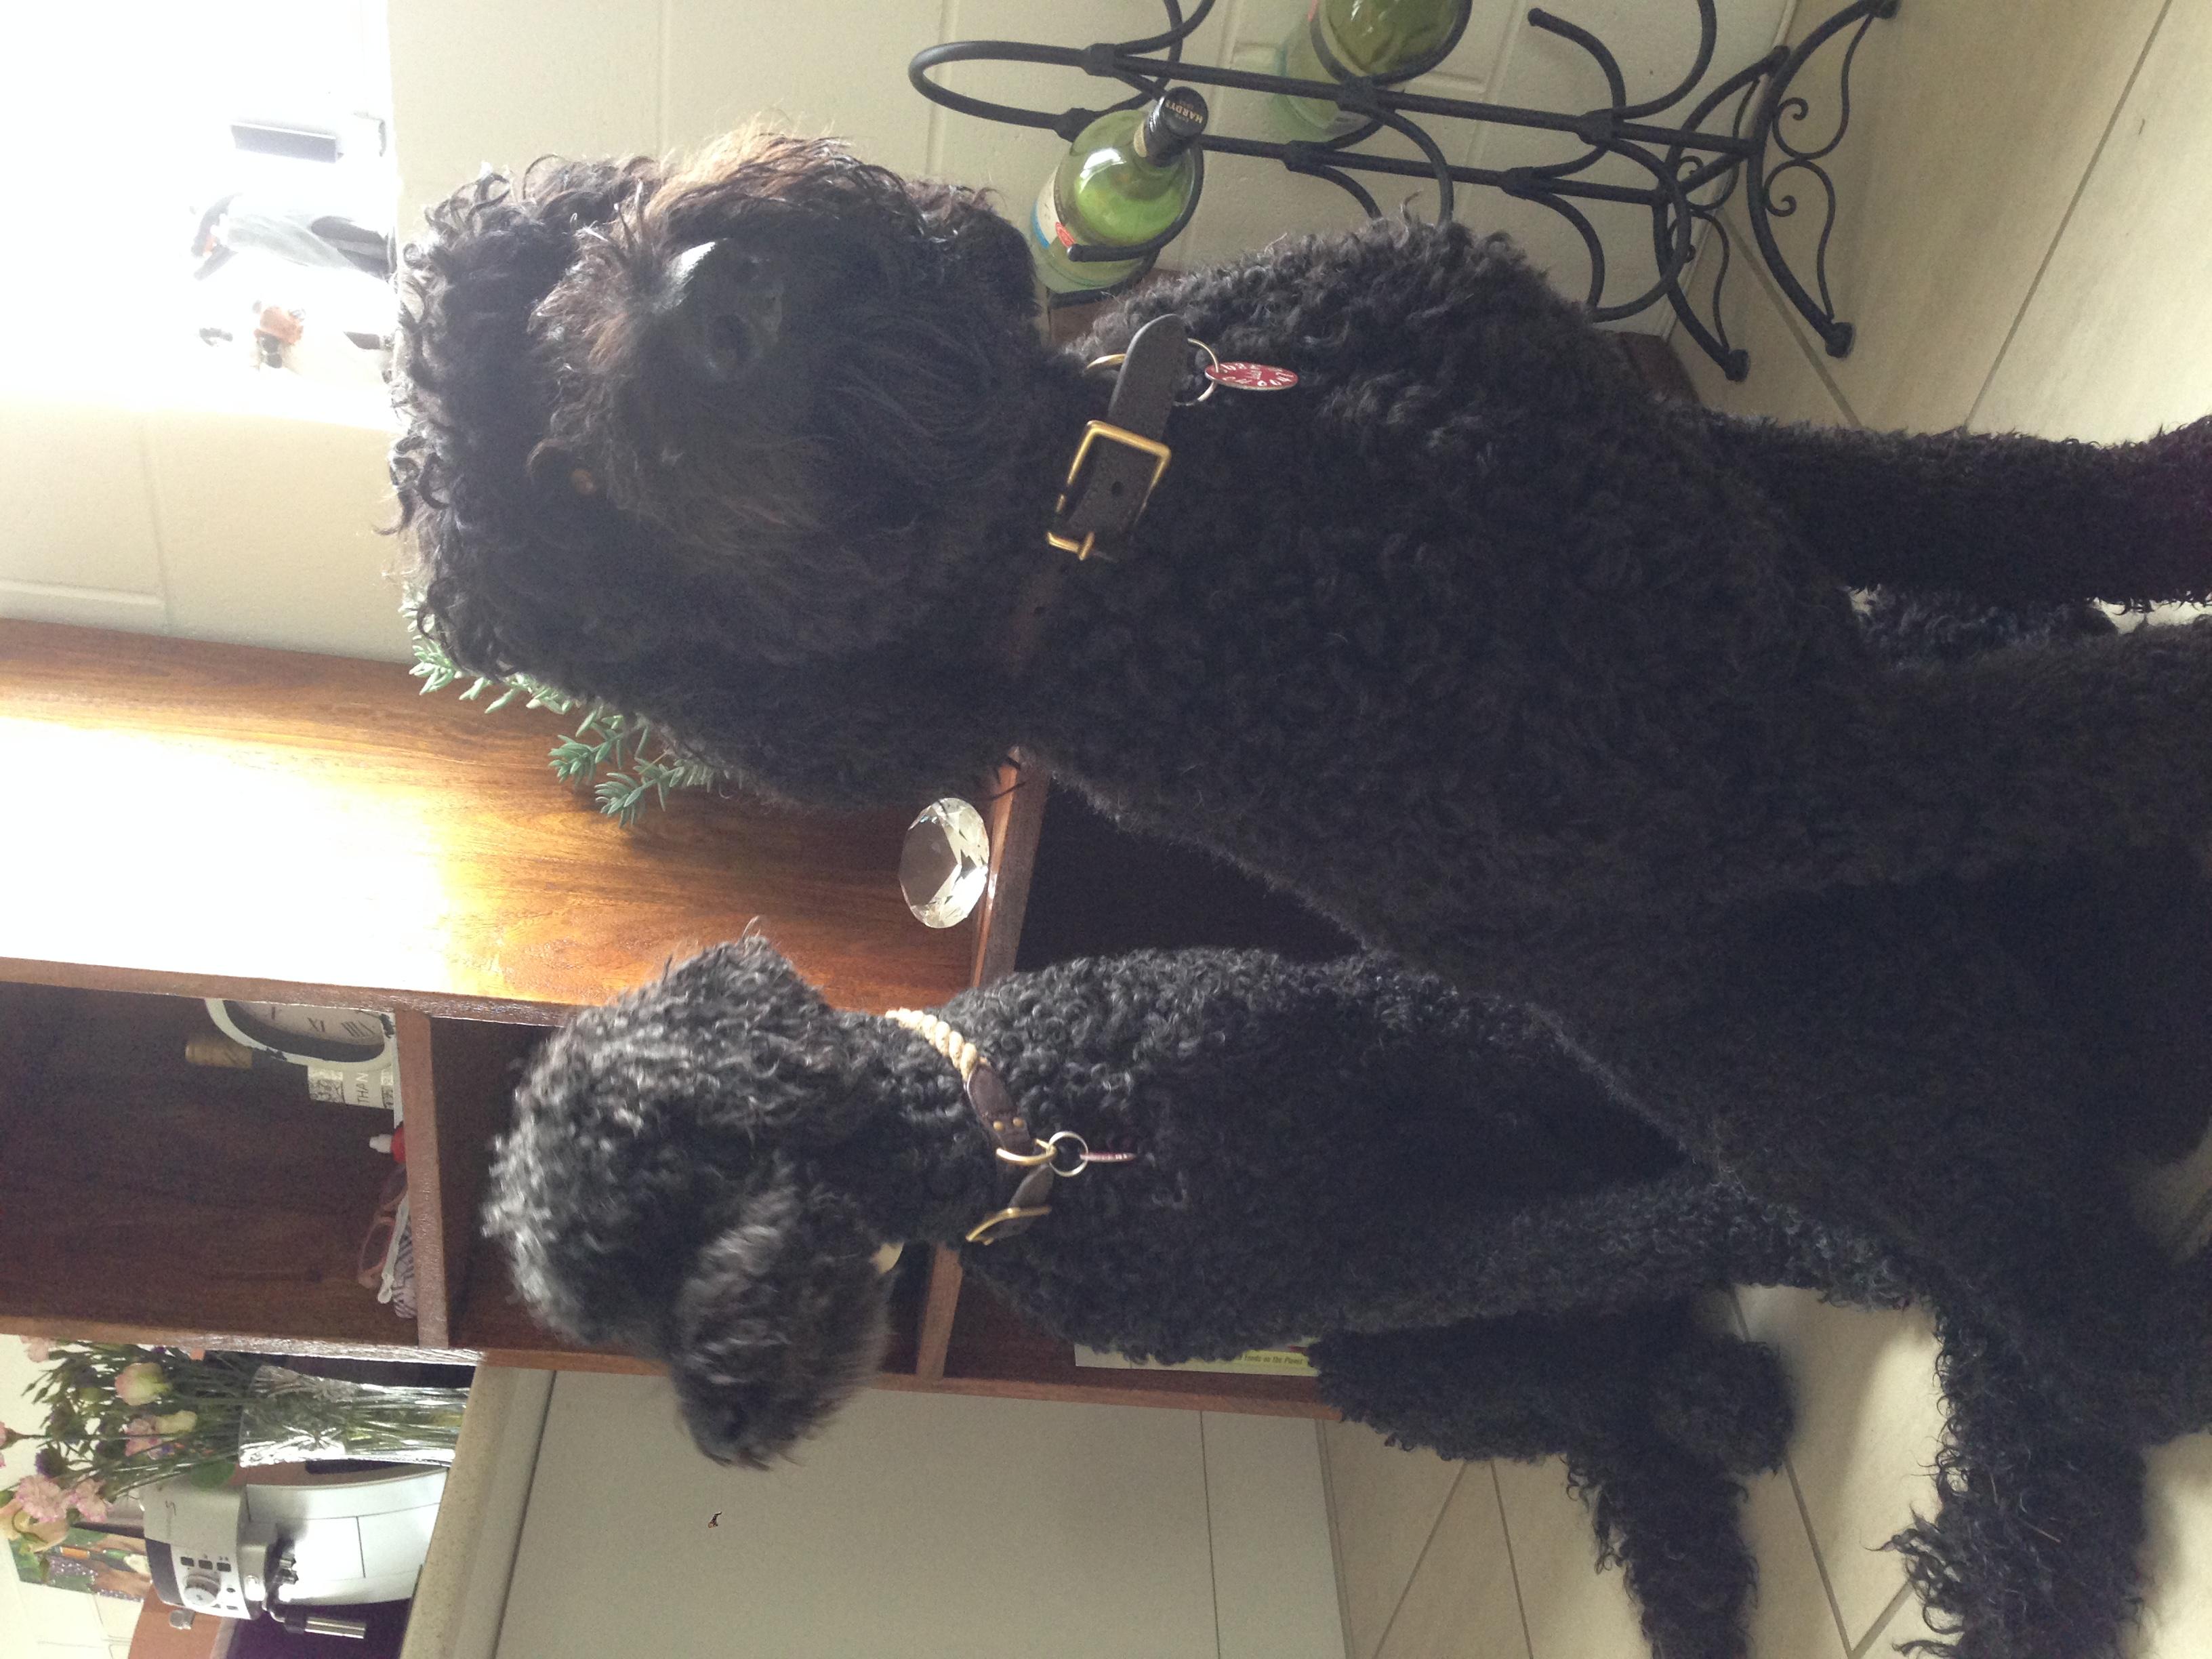 Zozo and Lola